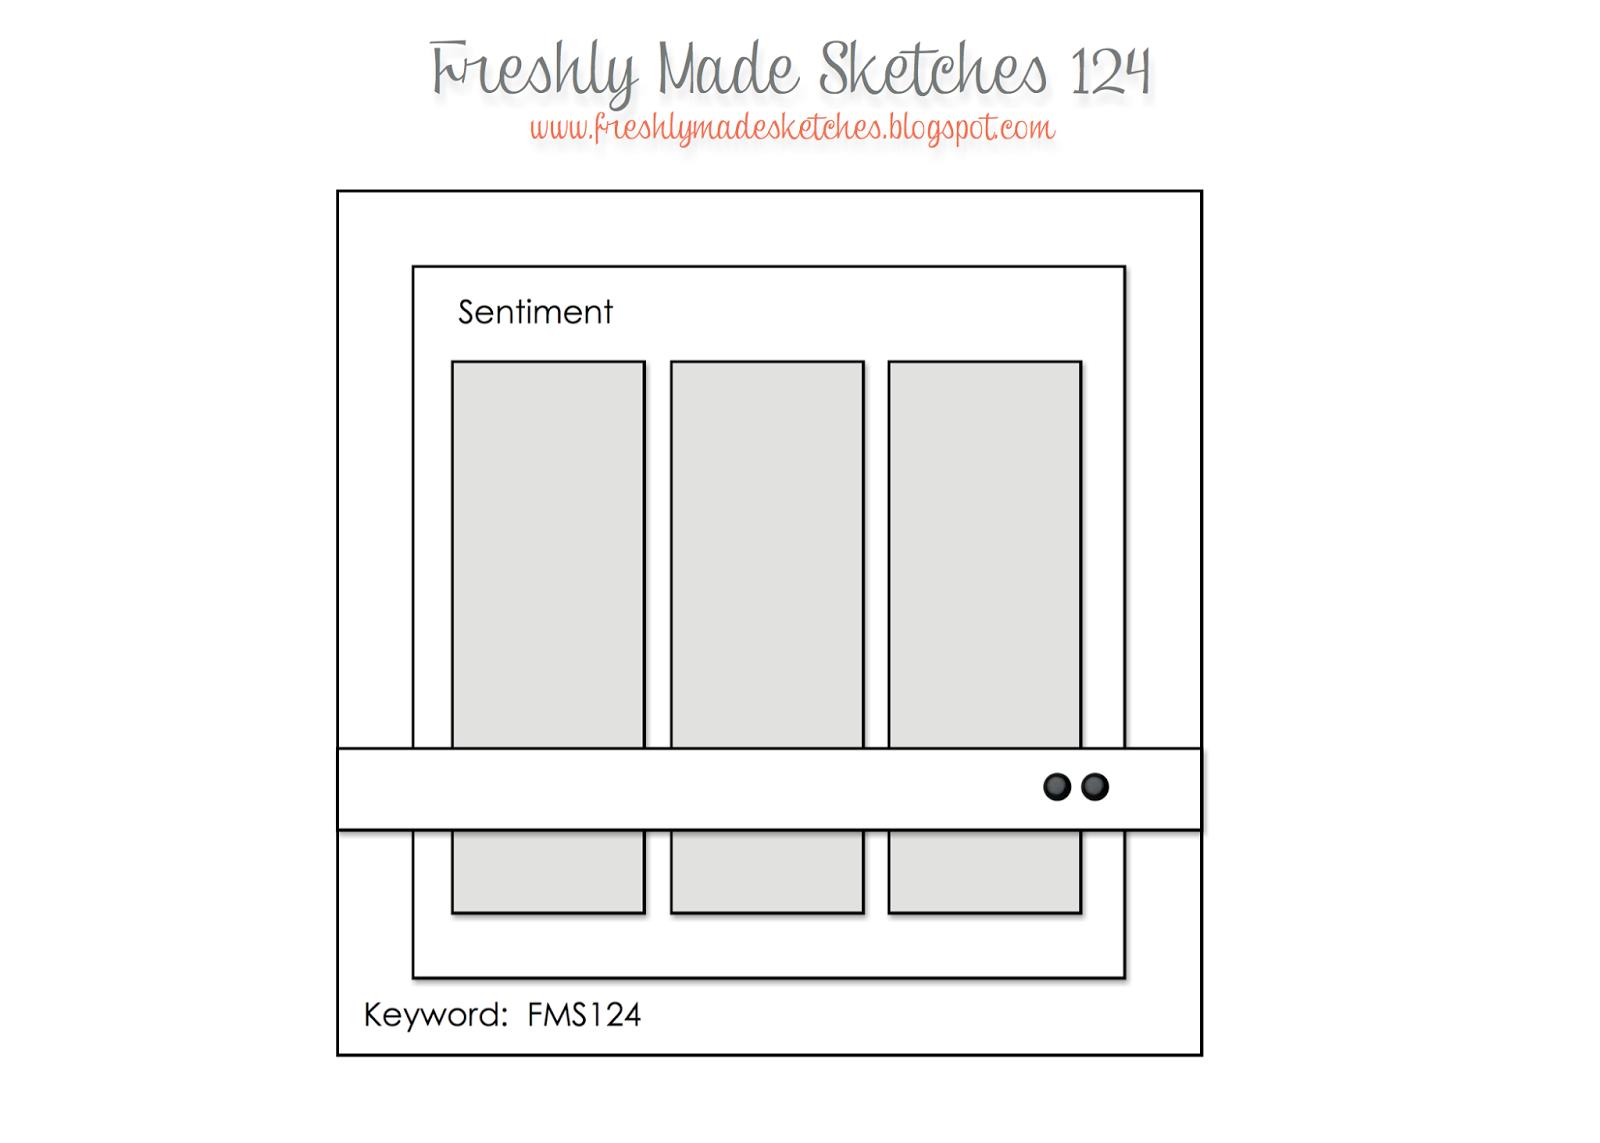 http://freshlymadesketches.blogspot.com/2014/02/freshly-made-sketches-124-sketch-by.html